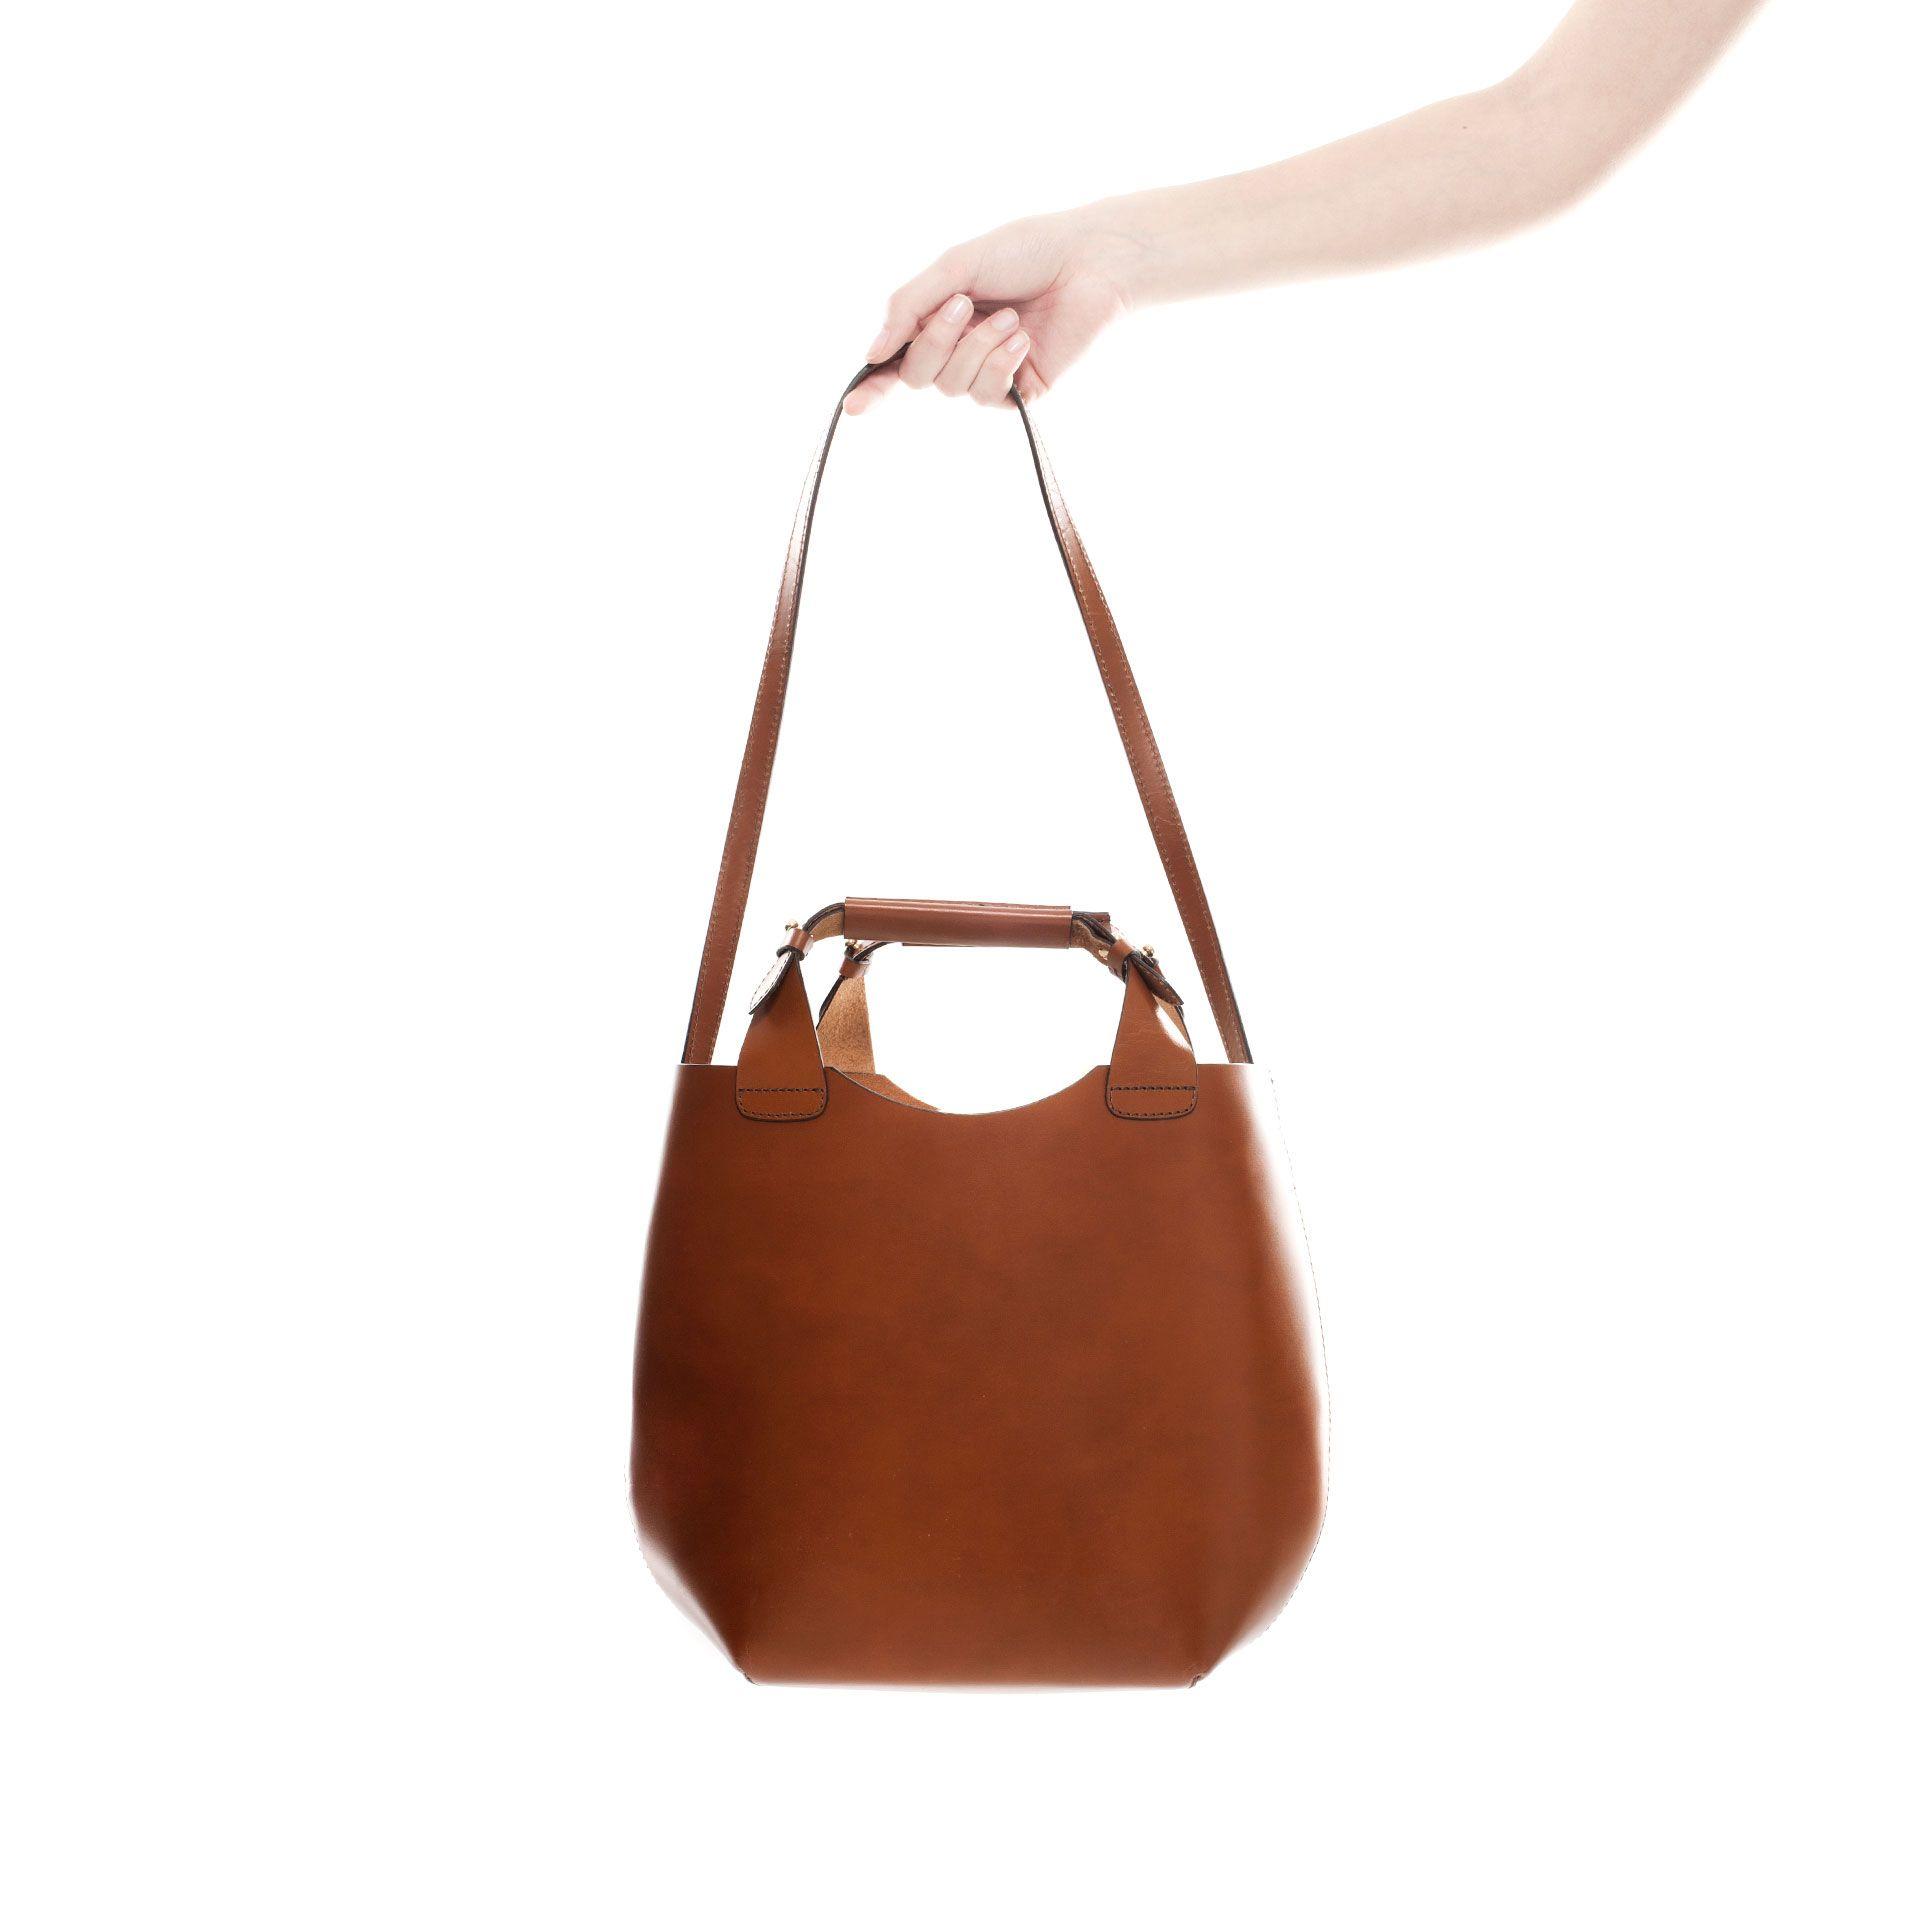 Mini leather tote bag zara - Bag Zara Mini Leather Tote